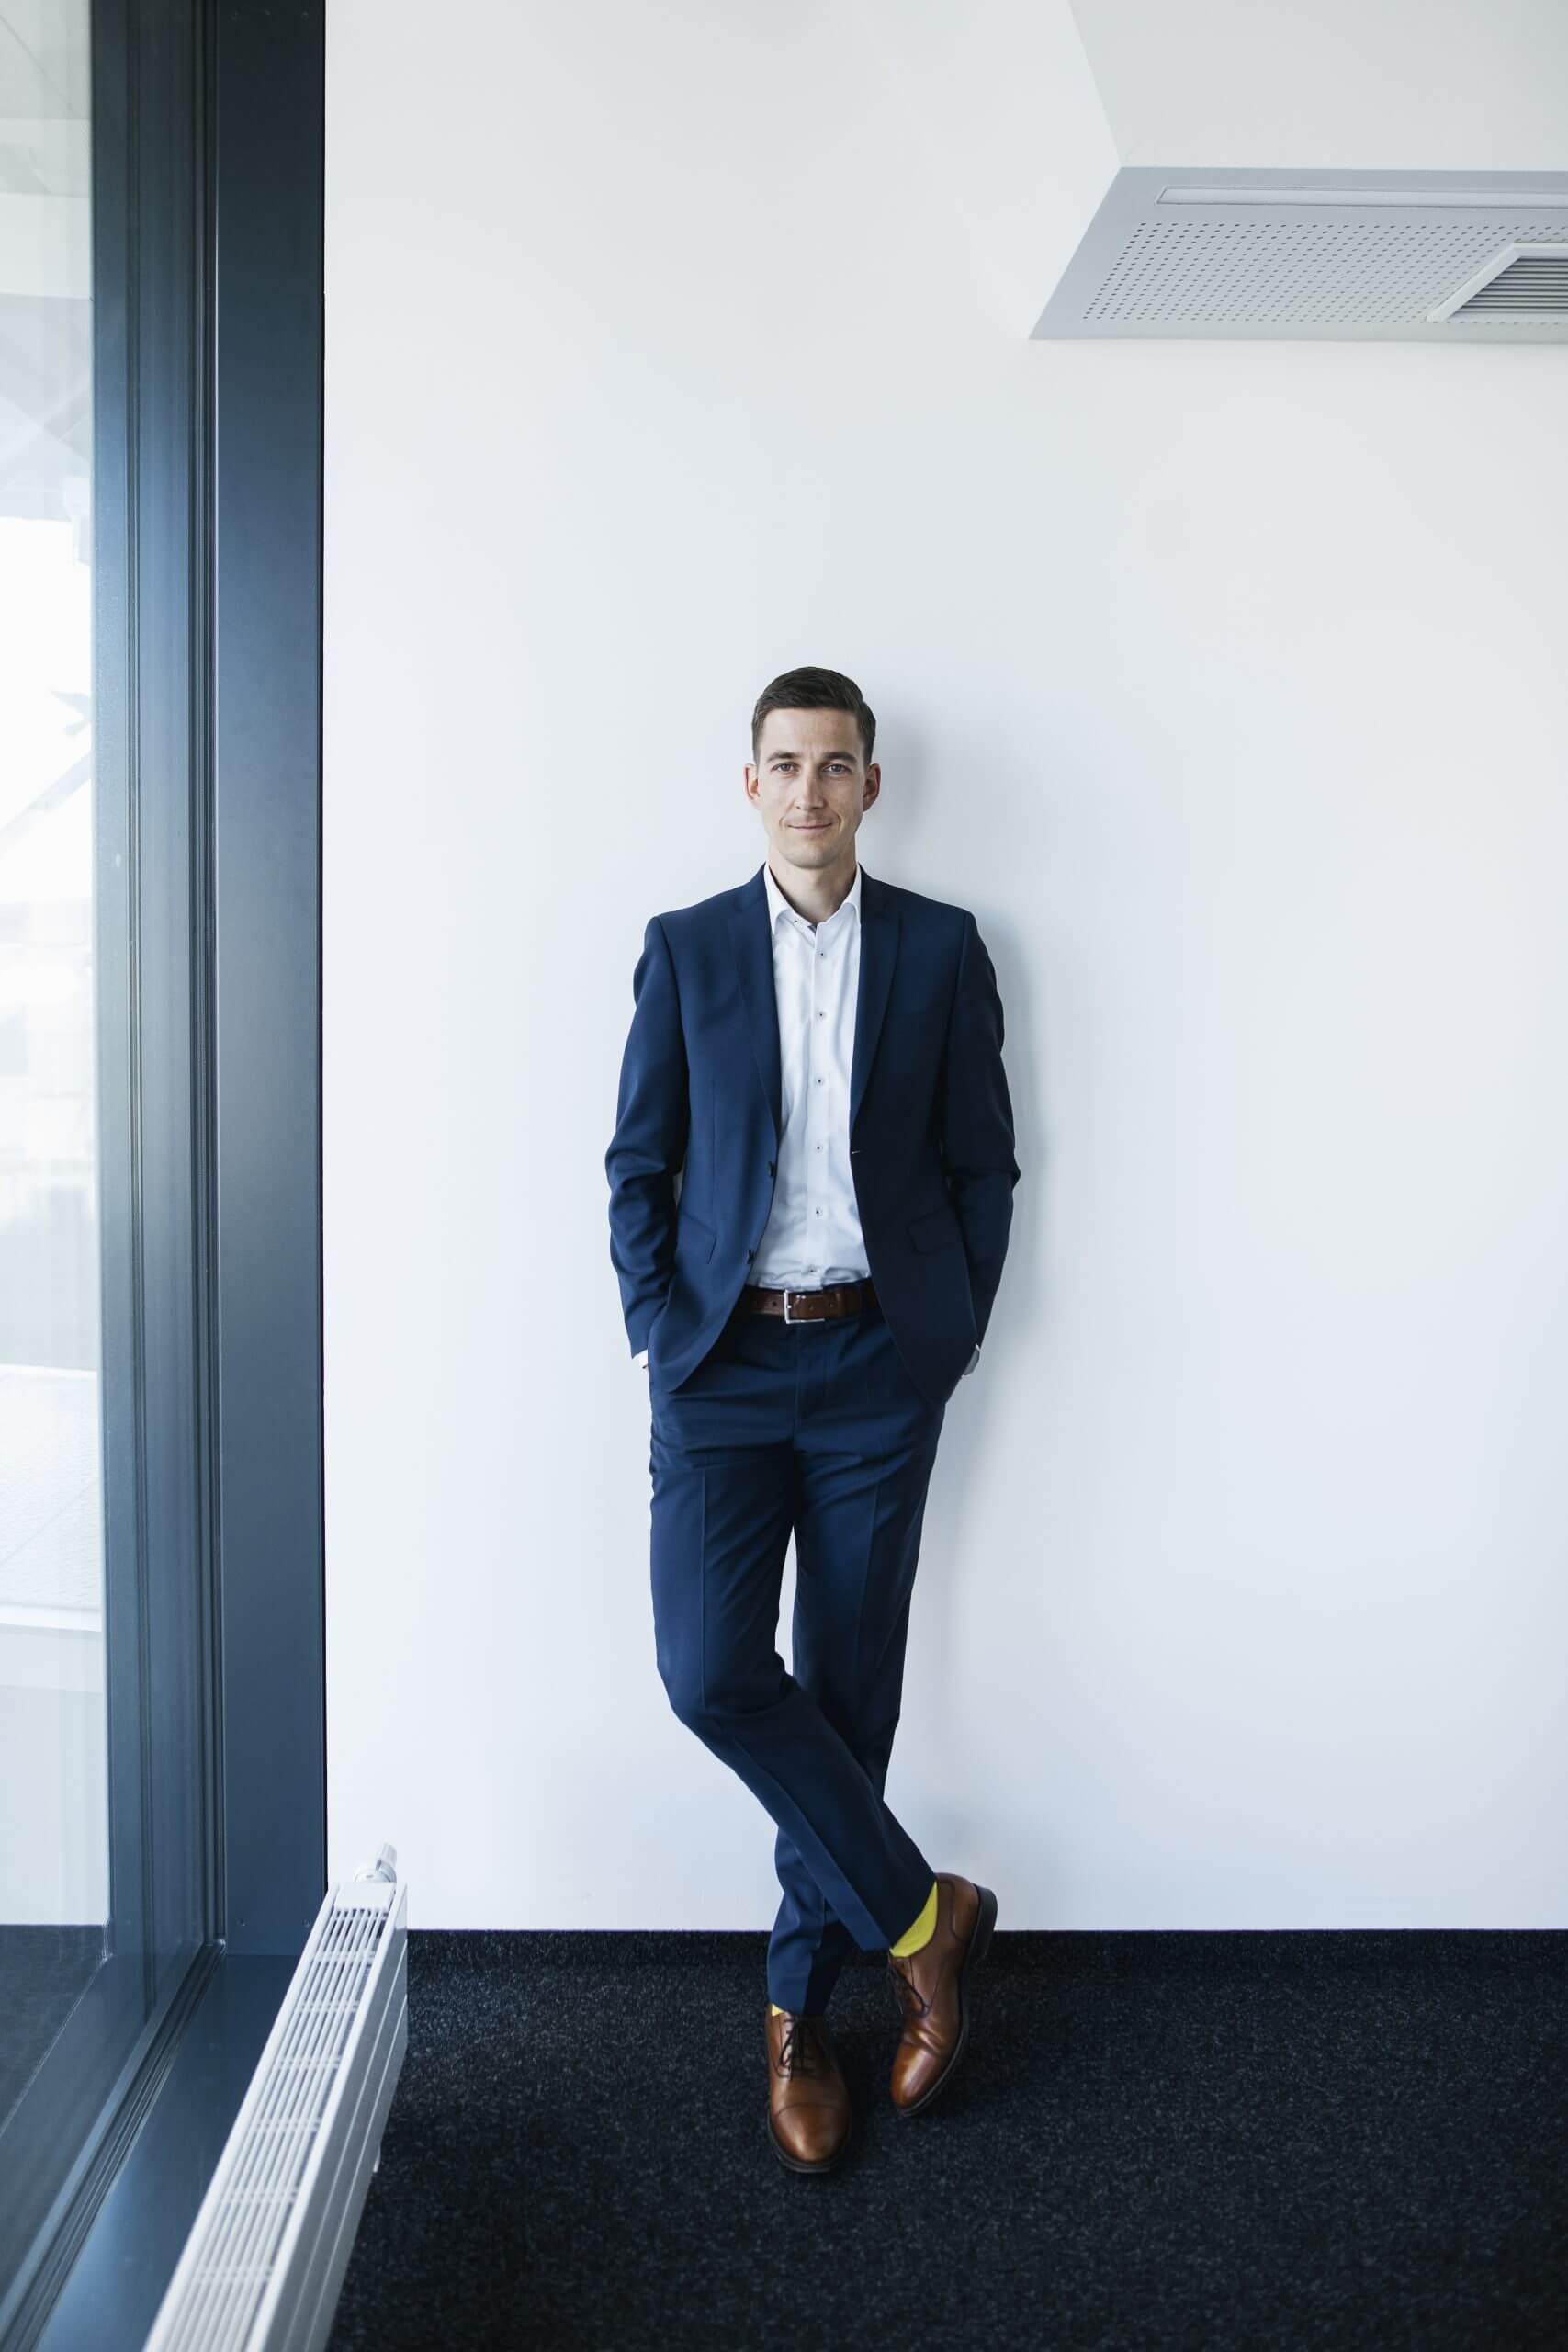 Johannes Holas, Vice President Fashion Solutions, KNAPP AG